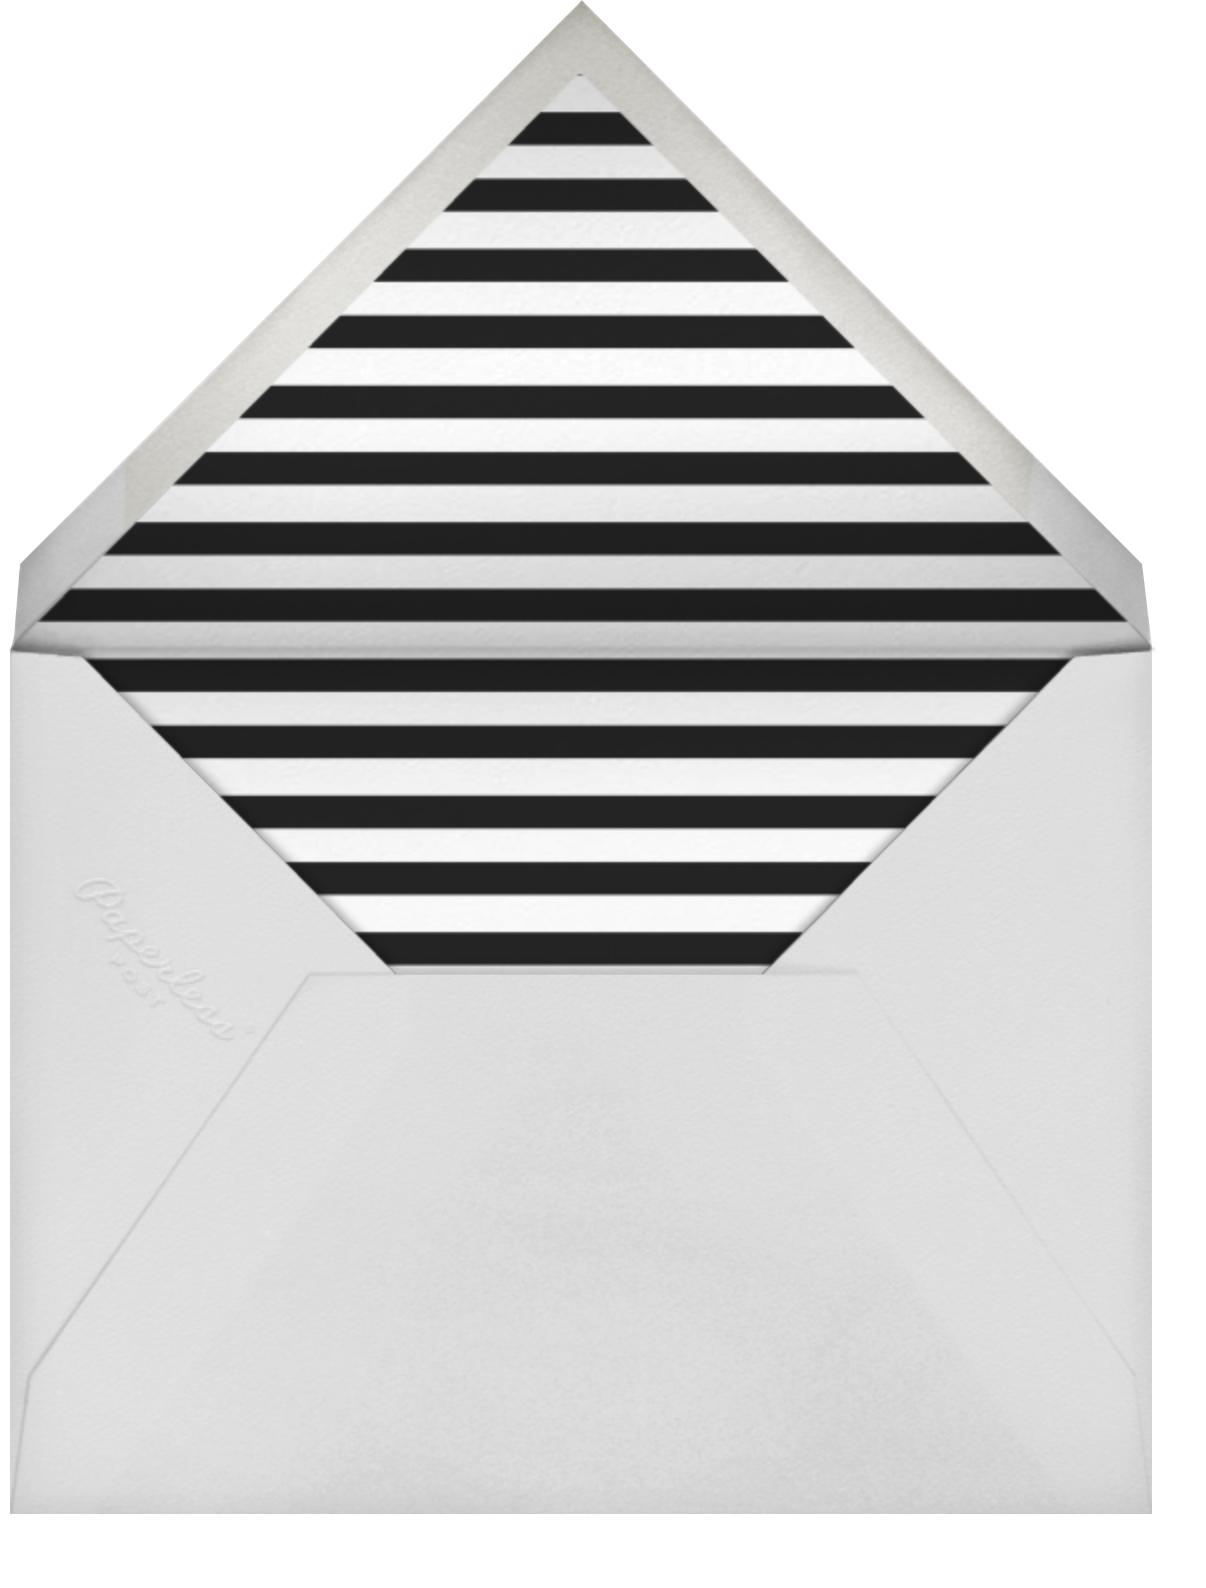 Quint - Black/Silver - Paperless Post - Graduation party - envelope back